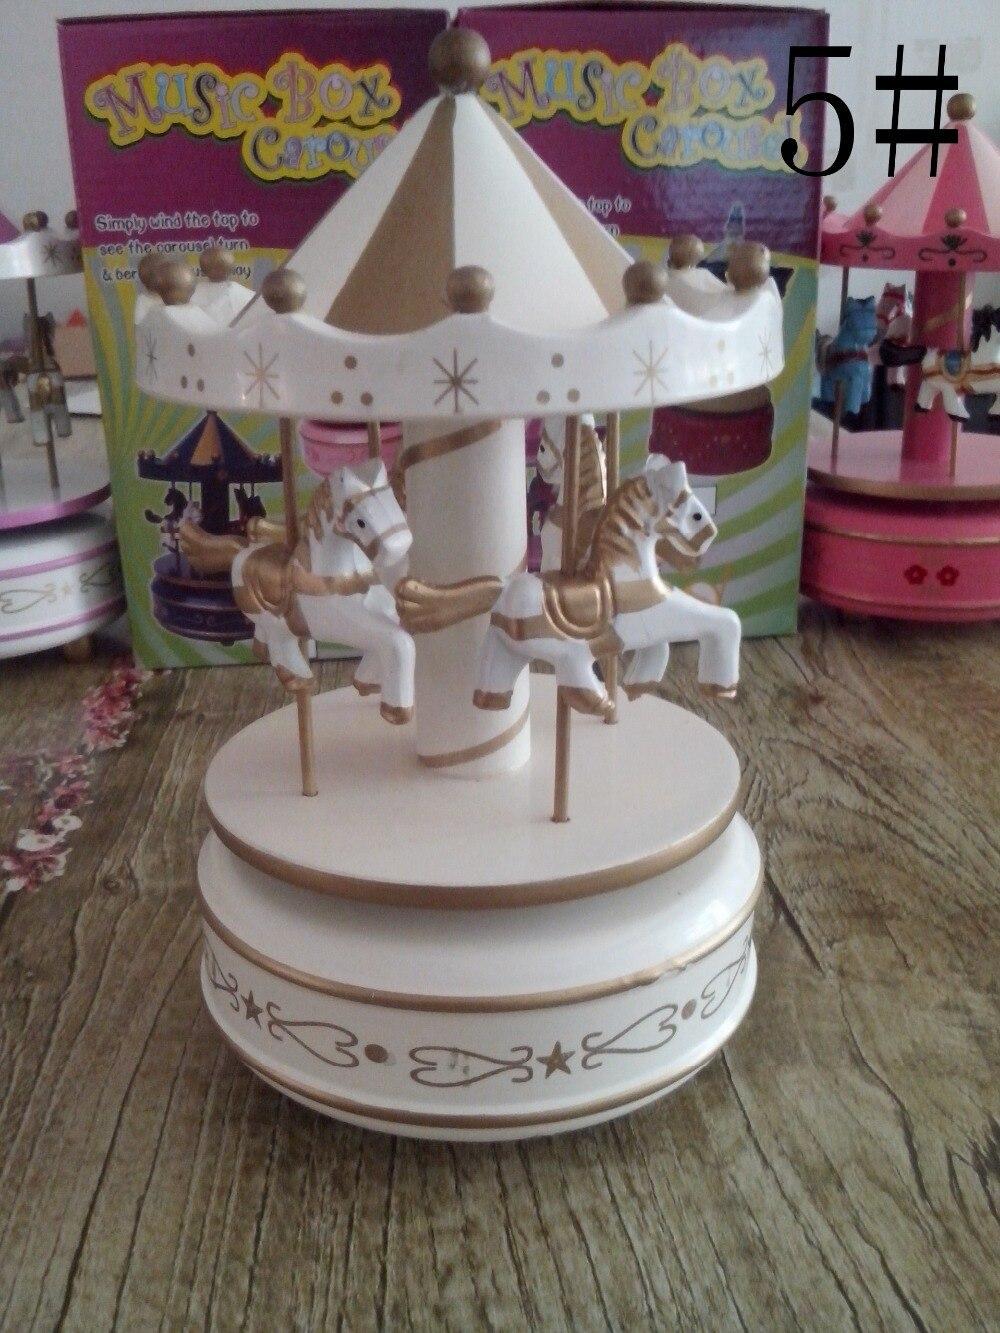 Wedding Gift Music Box : Carousel Music Box Music Box Laputa wedding gift Home Decoration ...